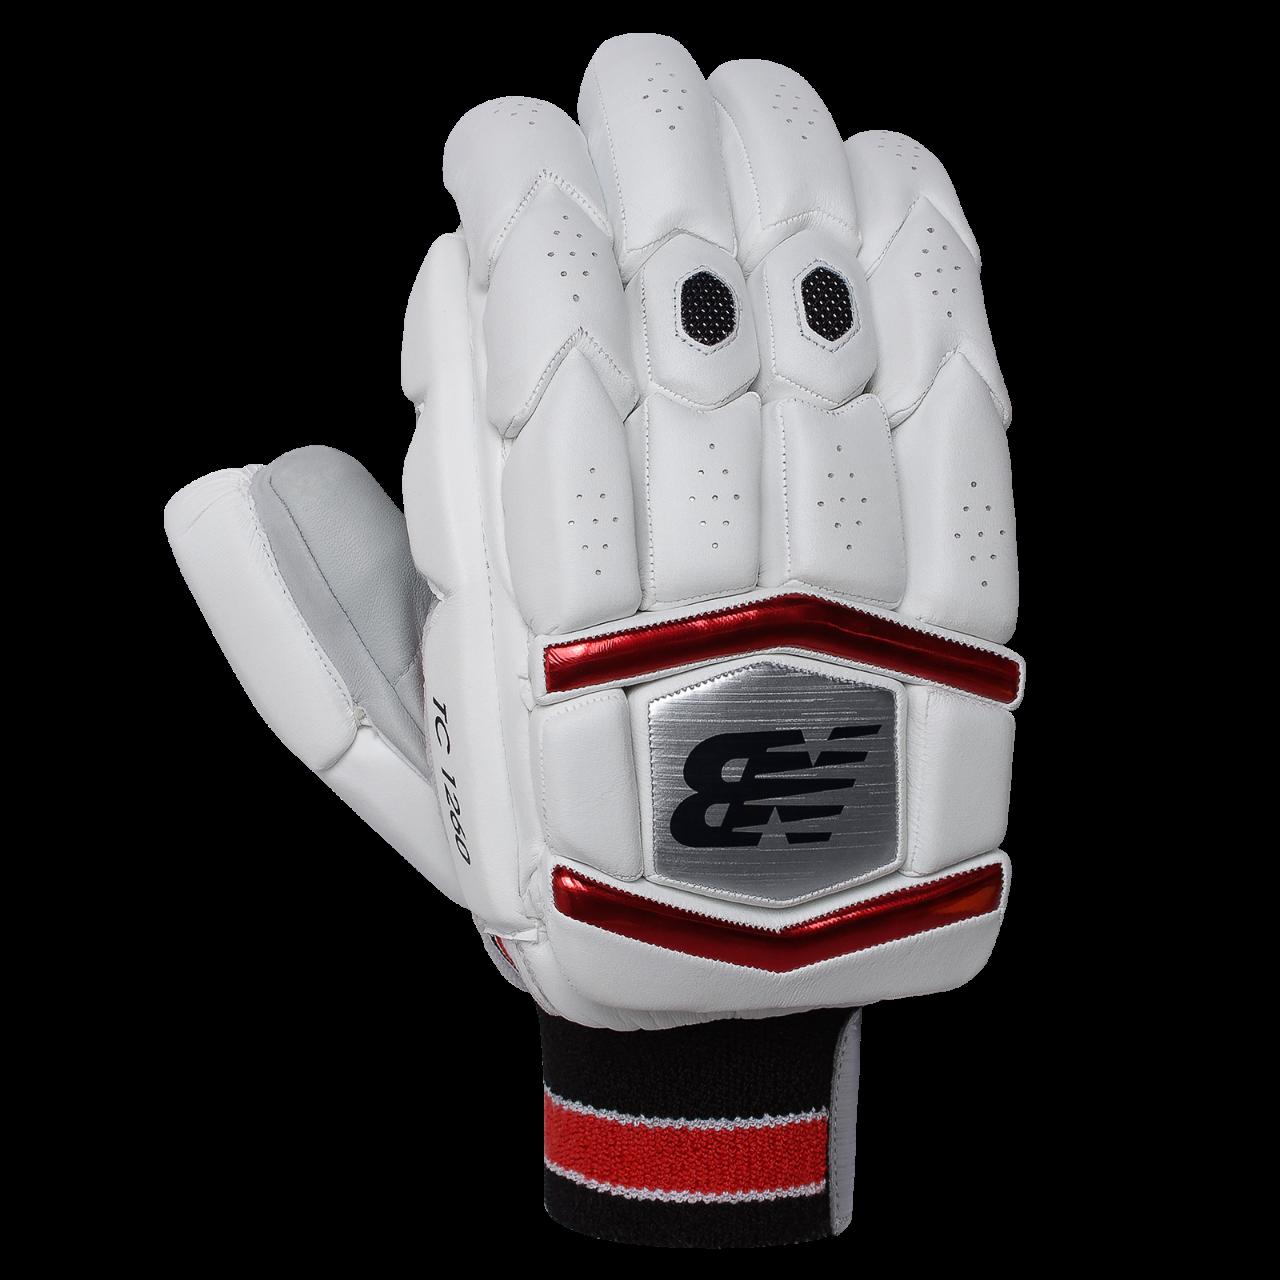 2021 New Balance TC 1260 Batting Gloves